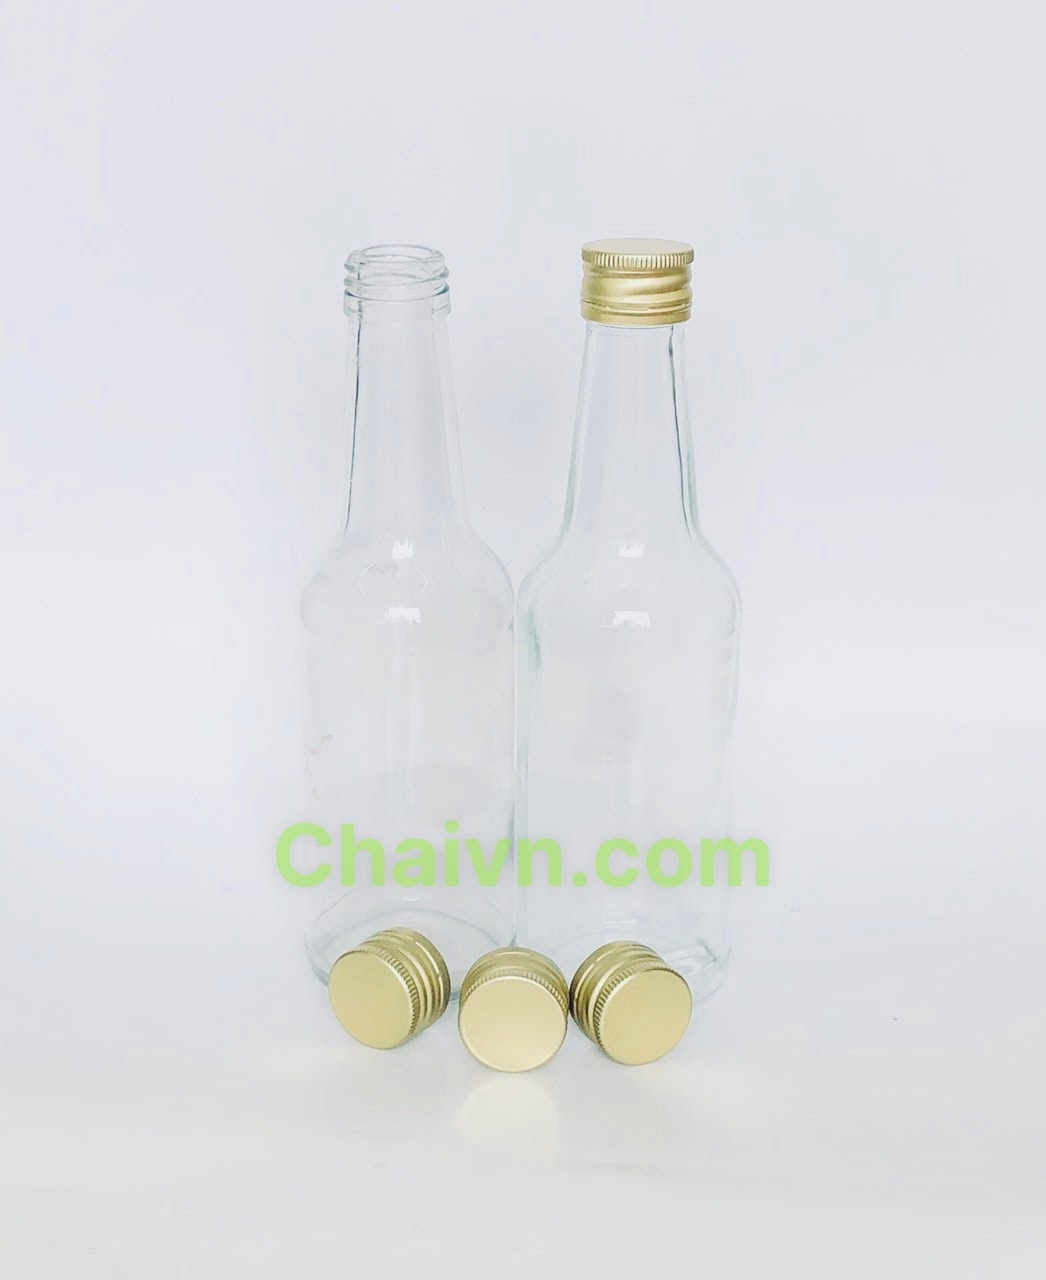 chai-thuy-tinh-300ml